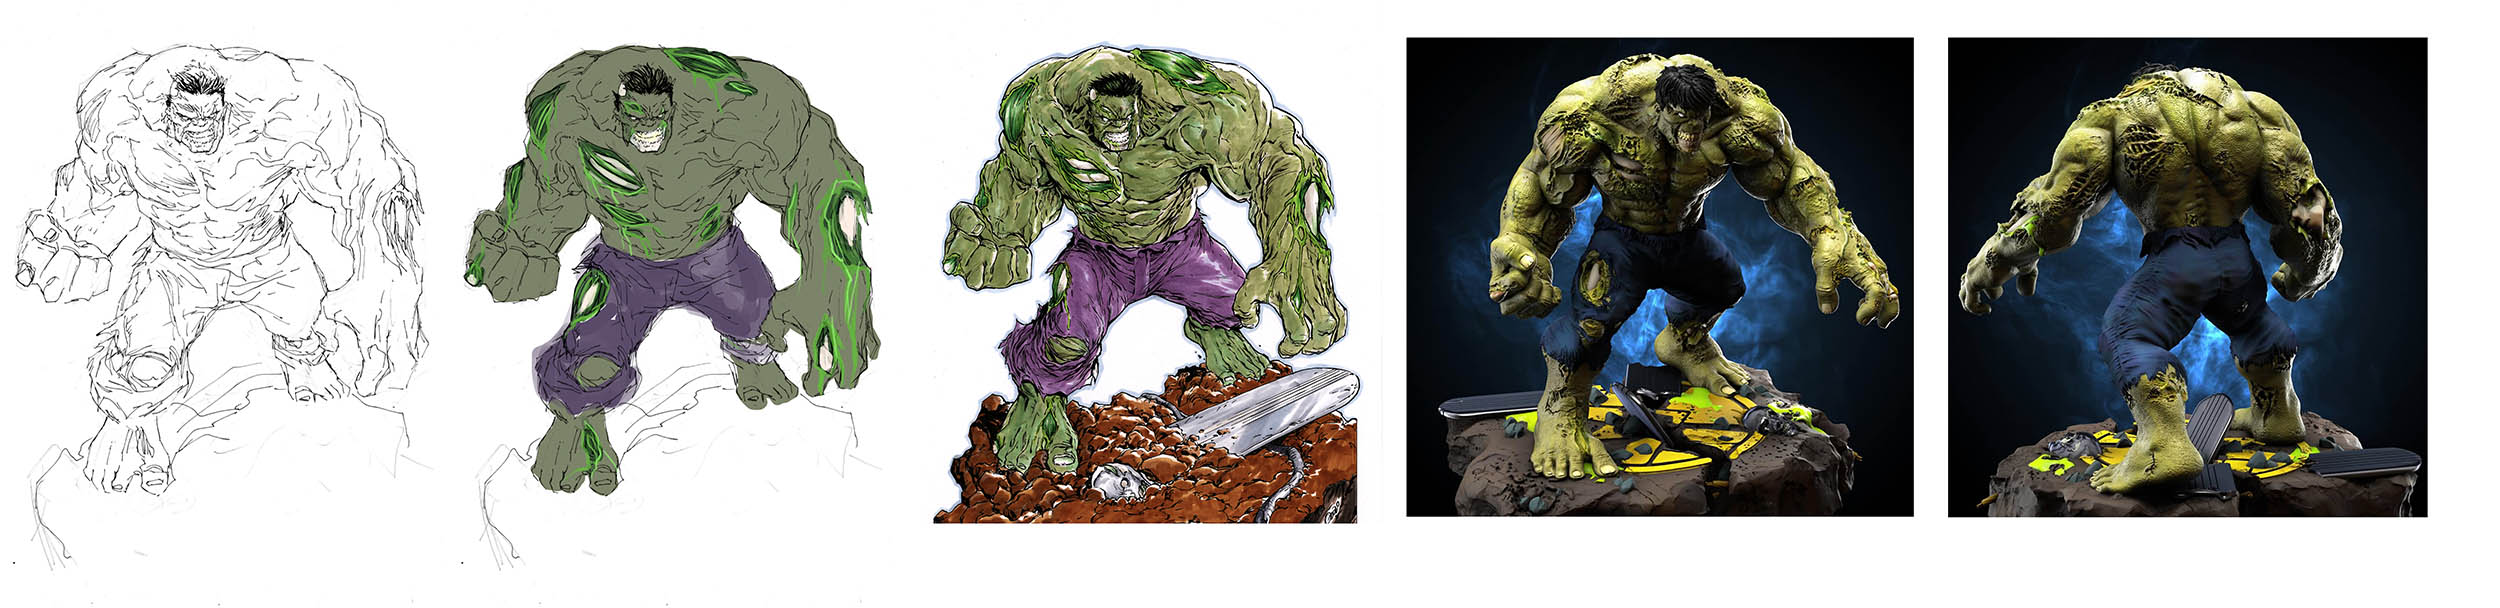 Zombie Hulk hero figurine